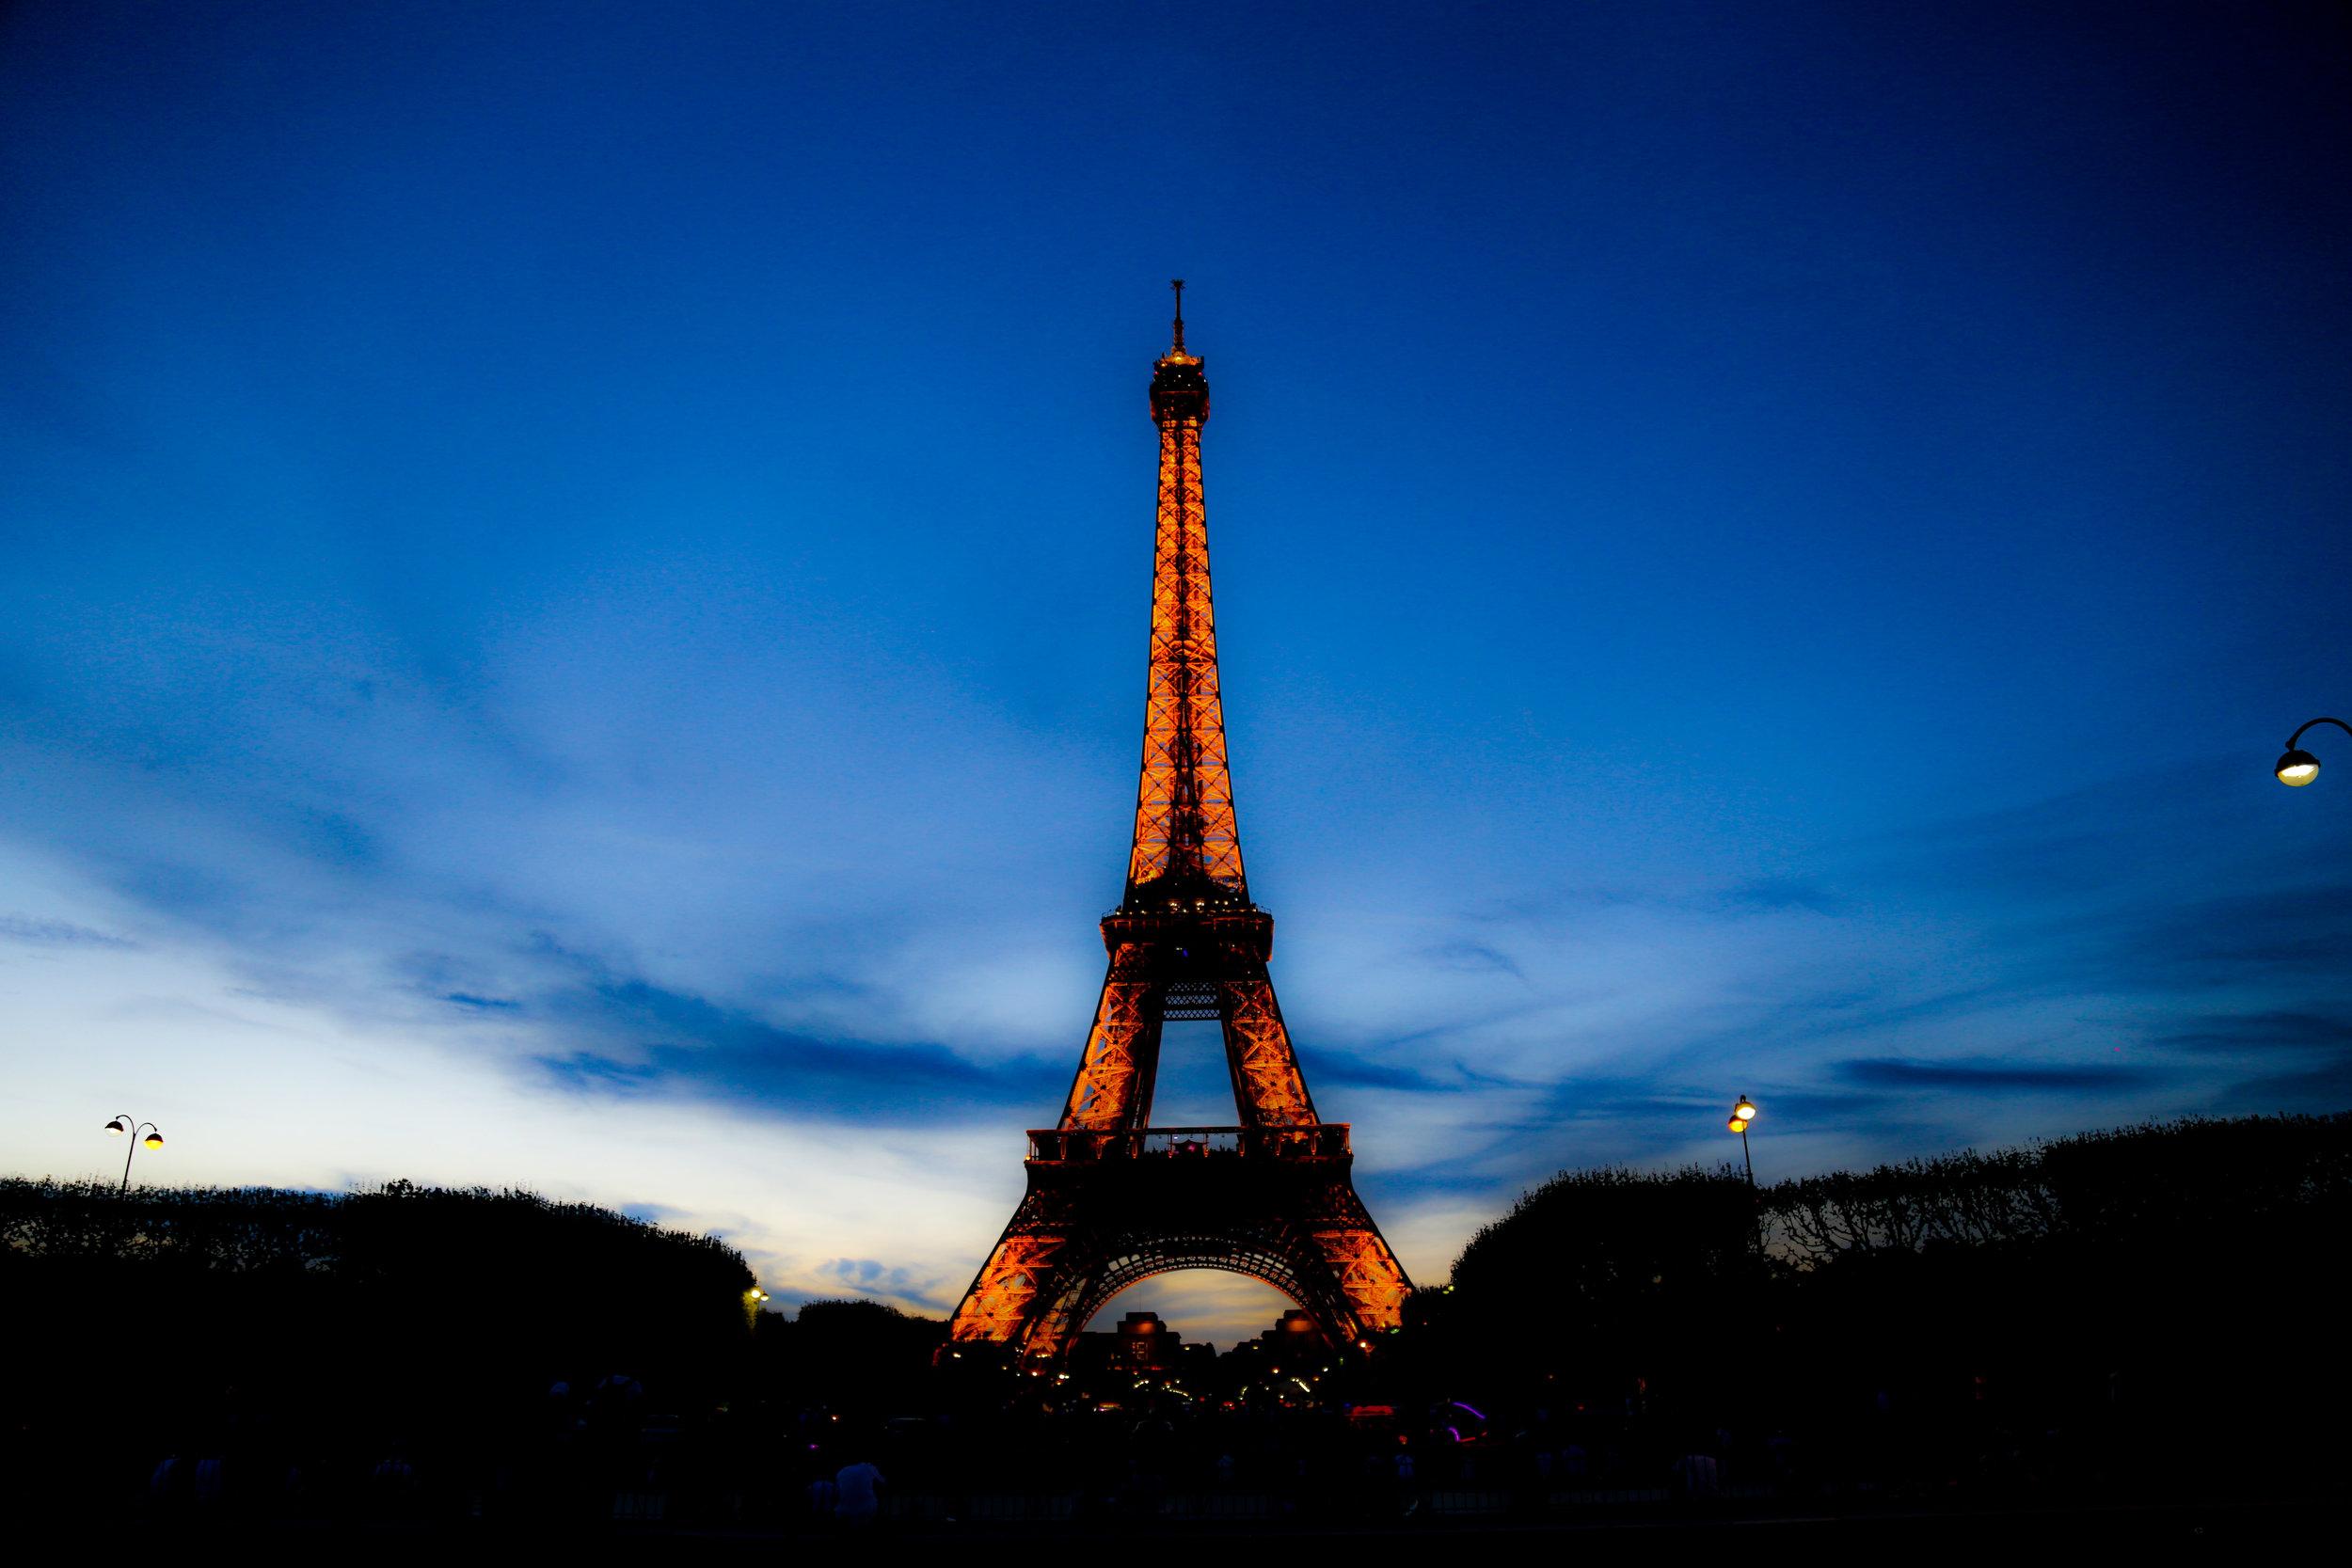 Eiffel_Tower_At_Night.jpg